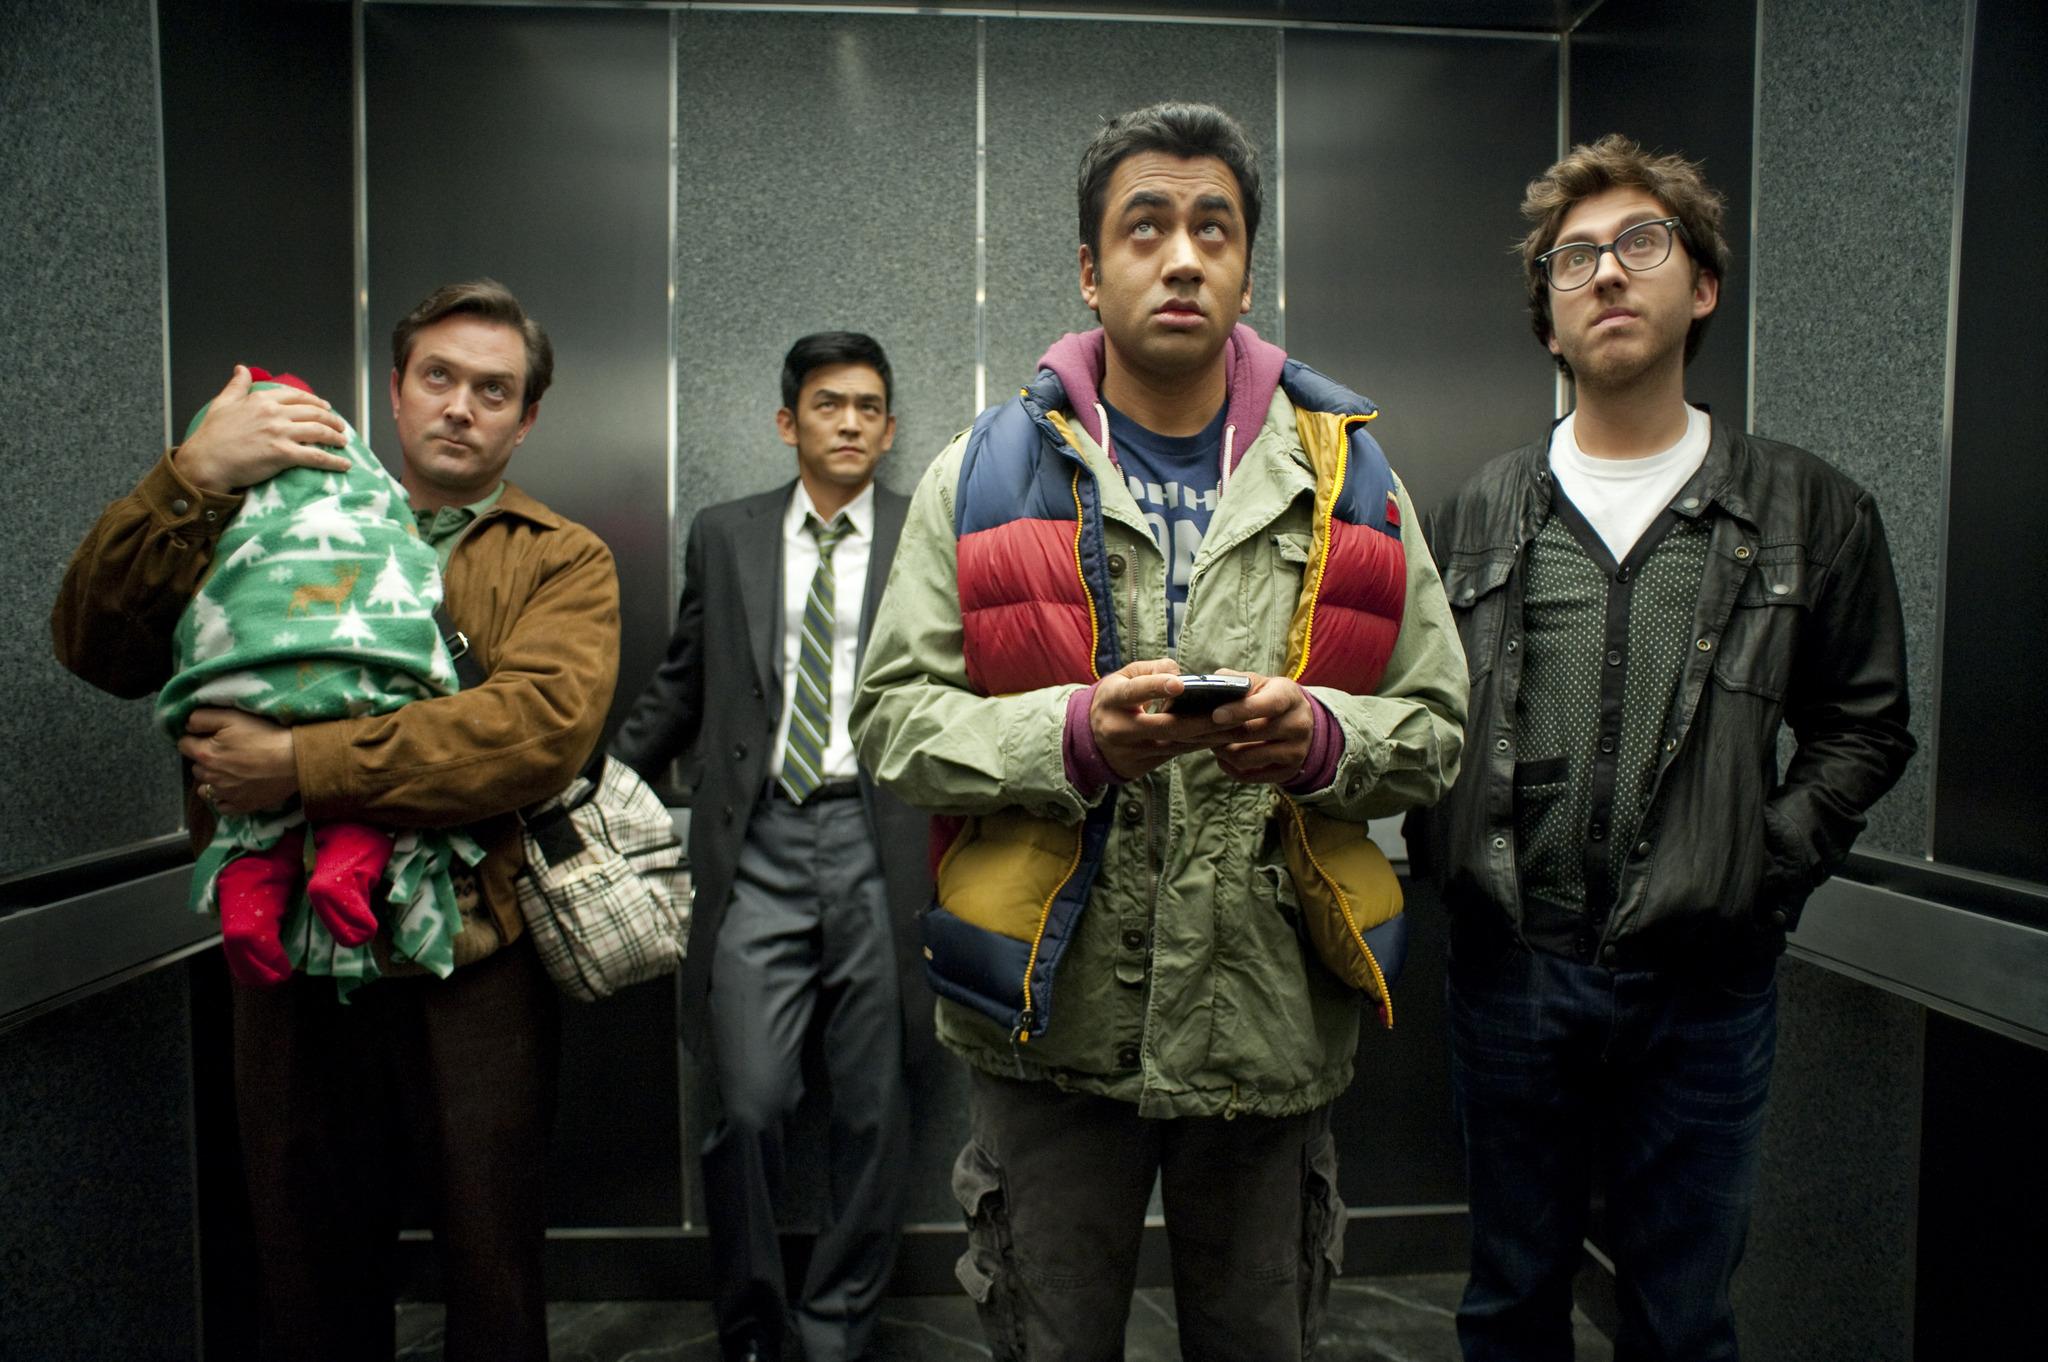 Still of John Cho, Thomas Lennon, Kal Penn and Amir Blumenfeld in A Very Harold & Kumar 3D Christmas (2011)